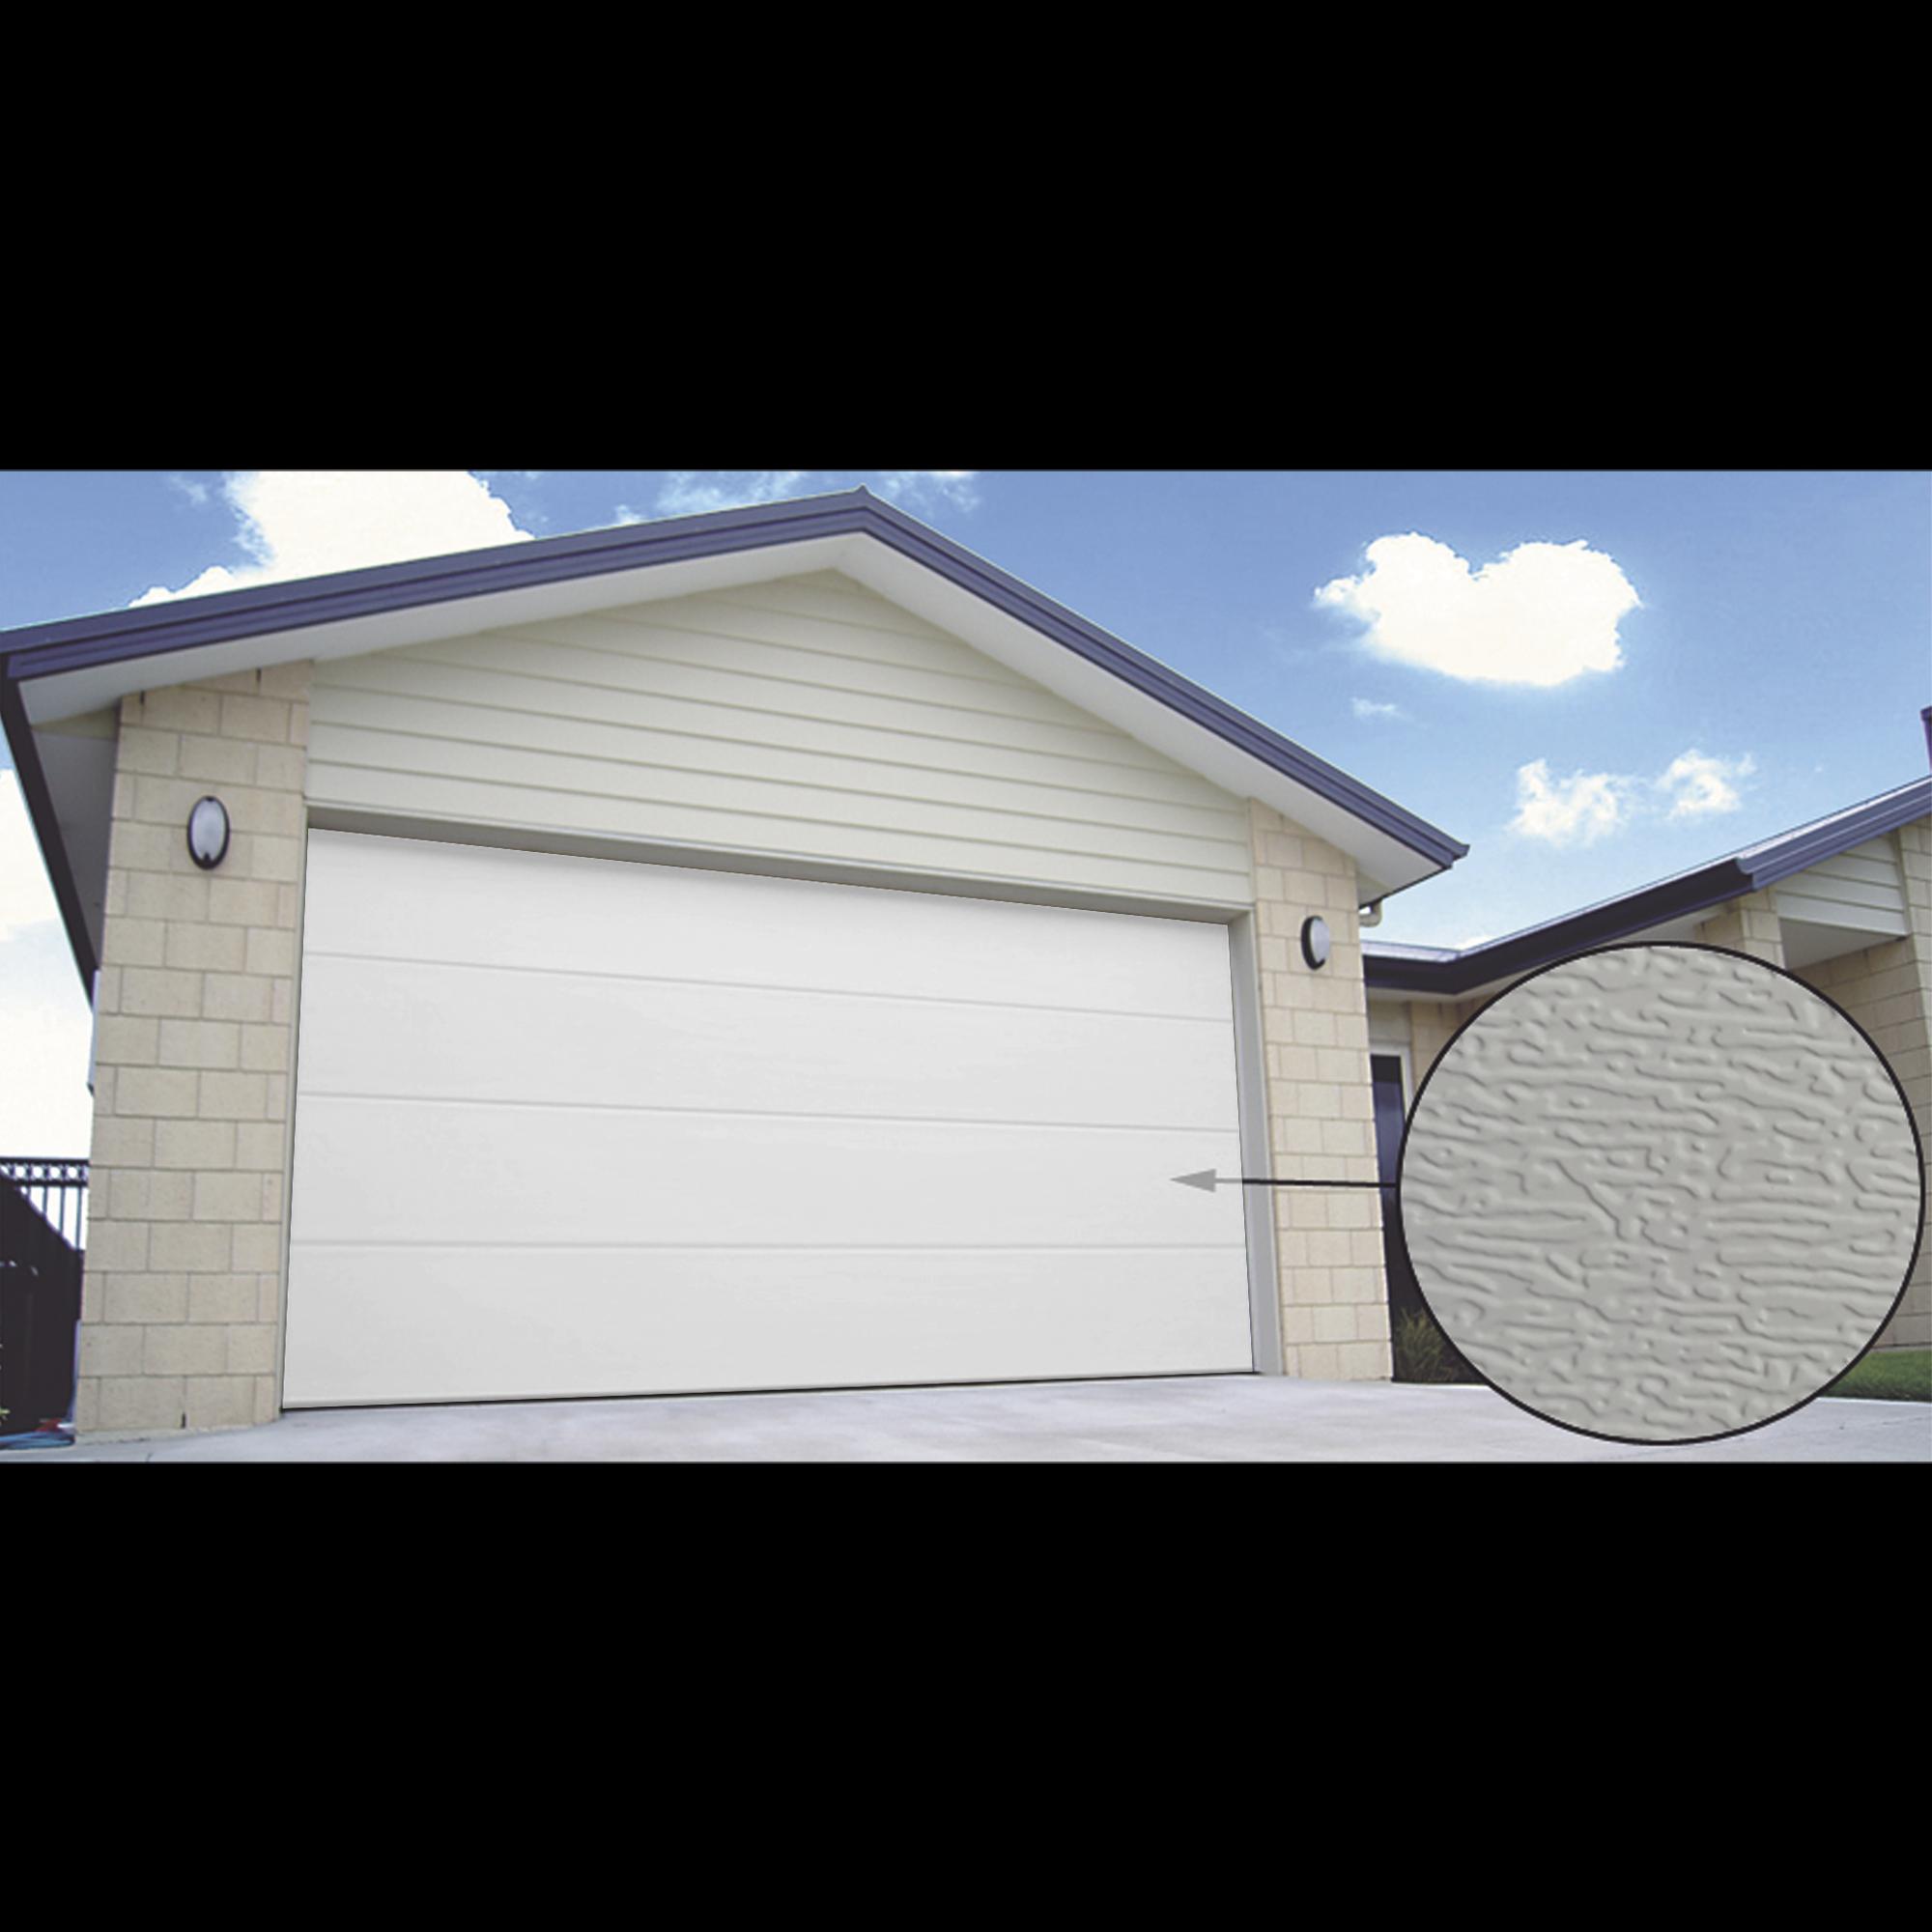 Puerta de Garage PREMIUM, Lisa color blanco  18X7 FT, AISLADA, Estilo U.S.A.